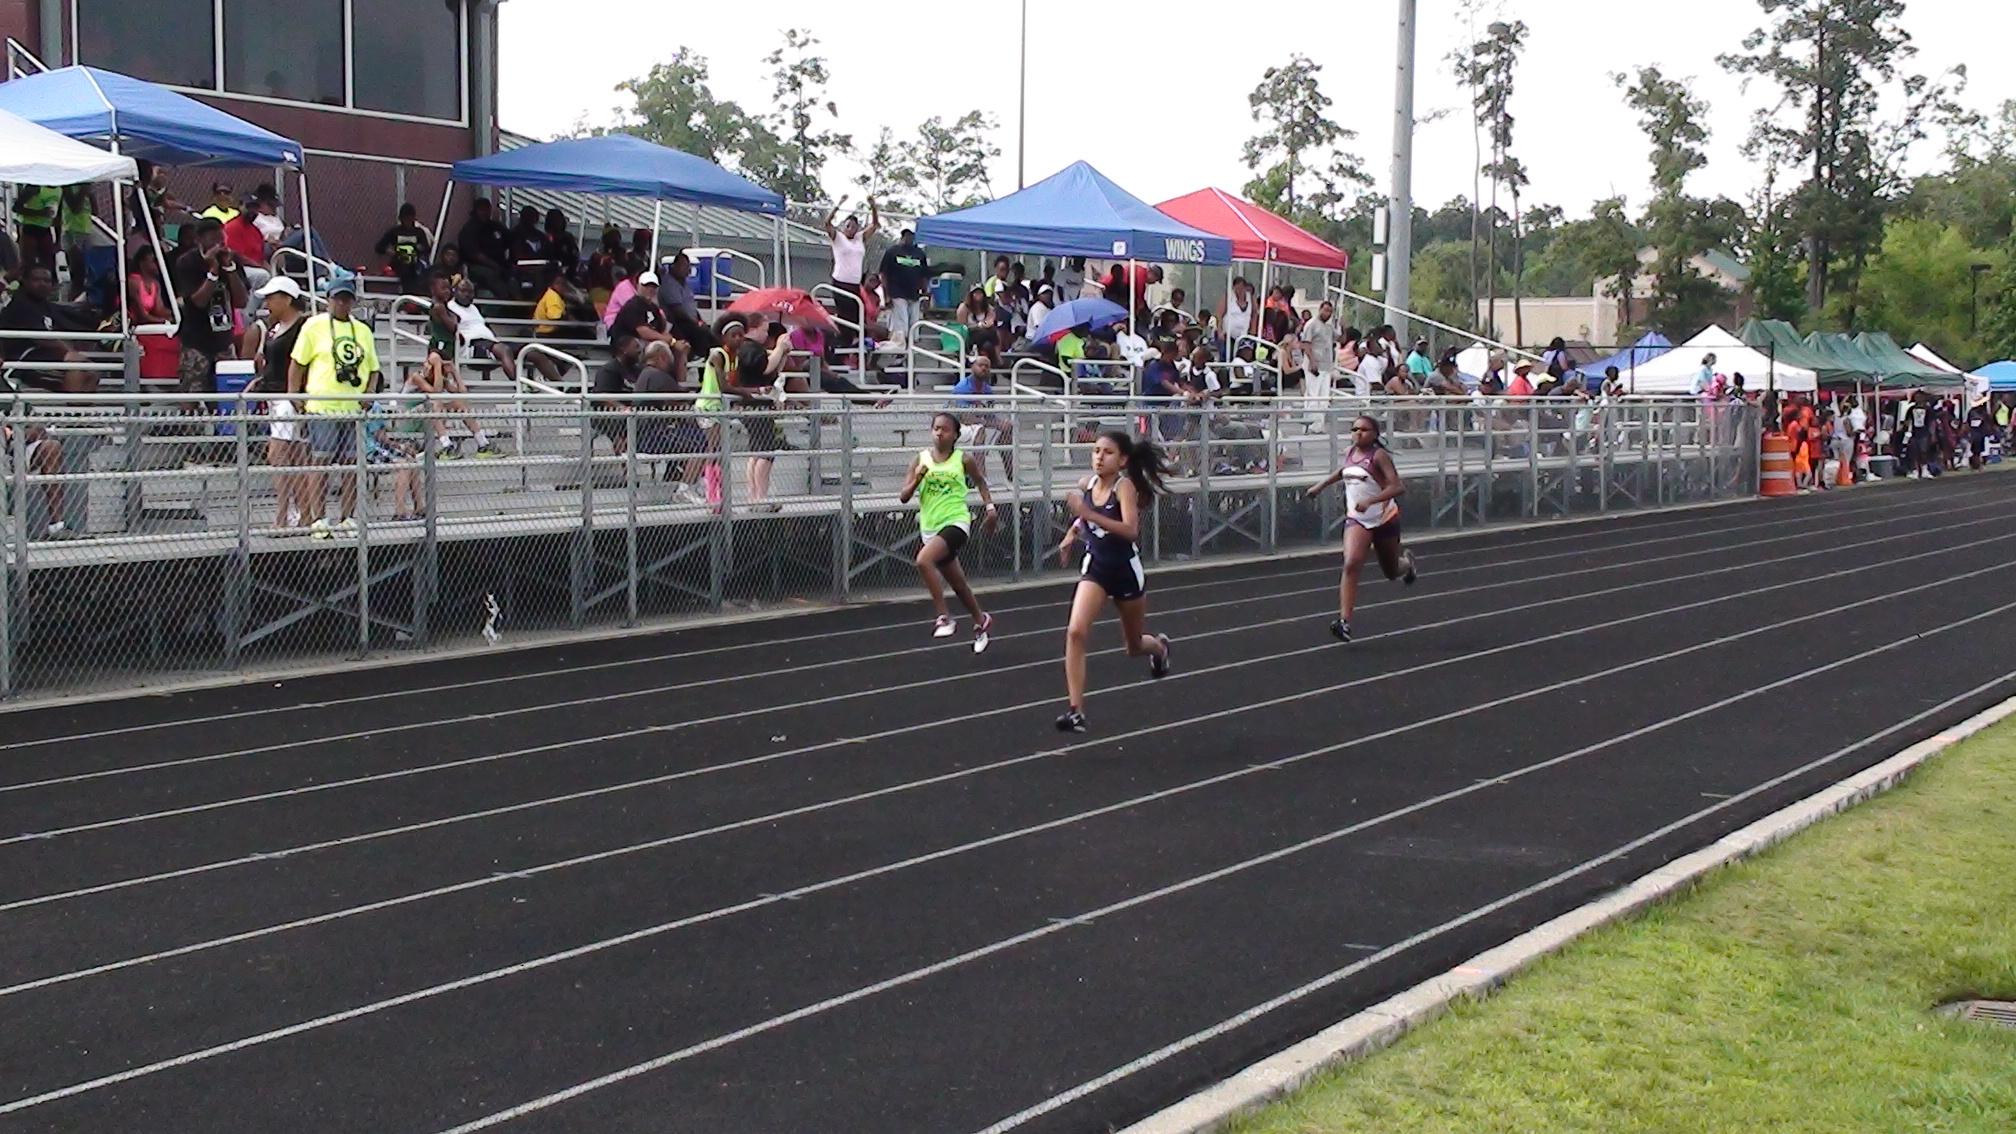 Sydney running the 200m